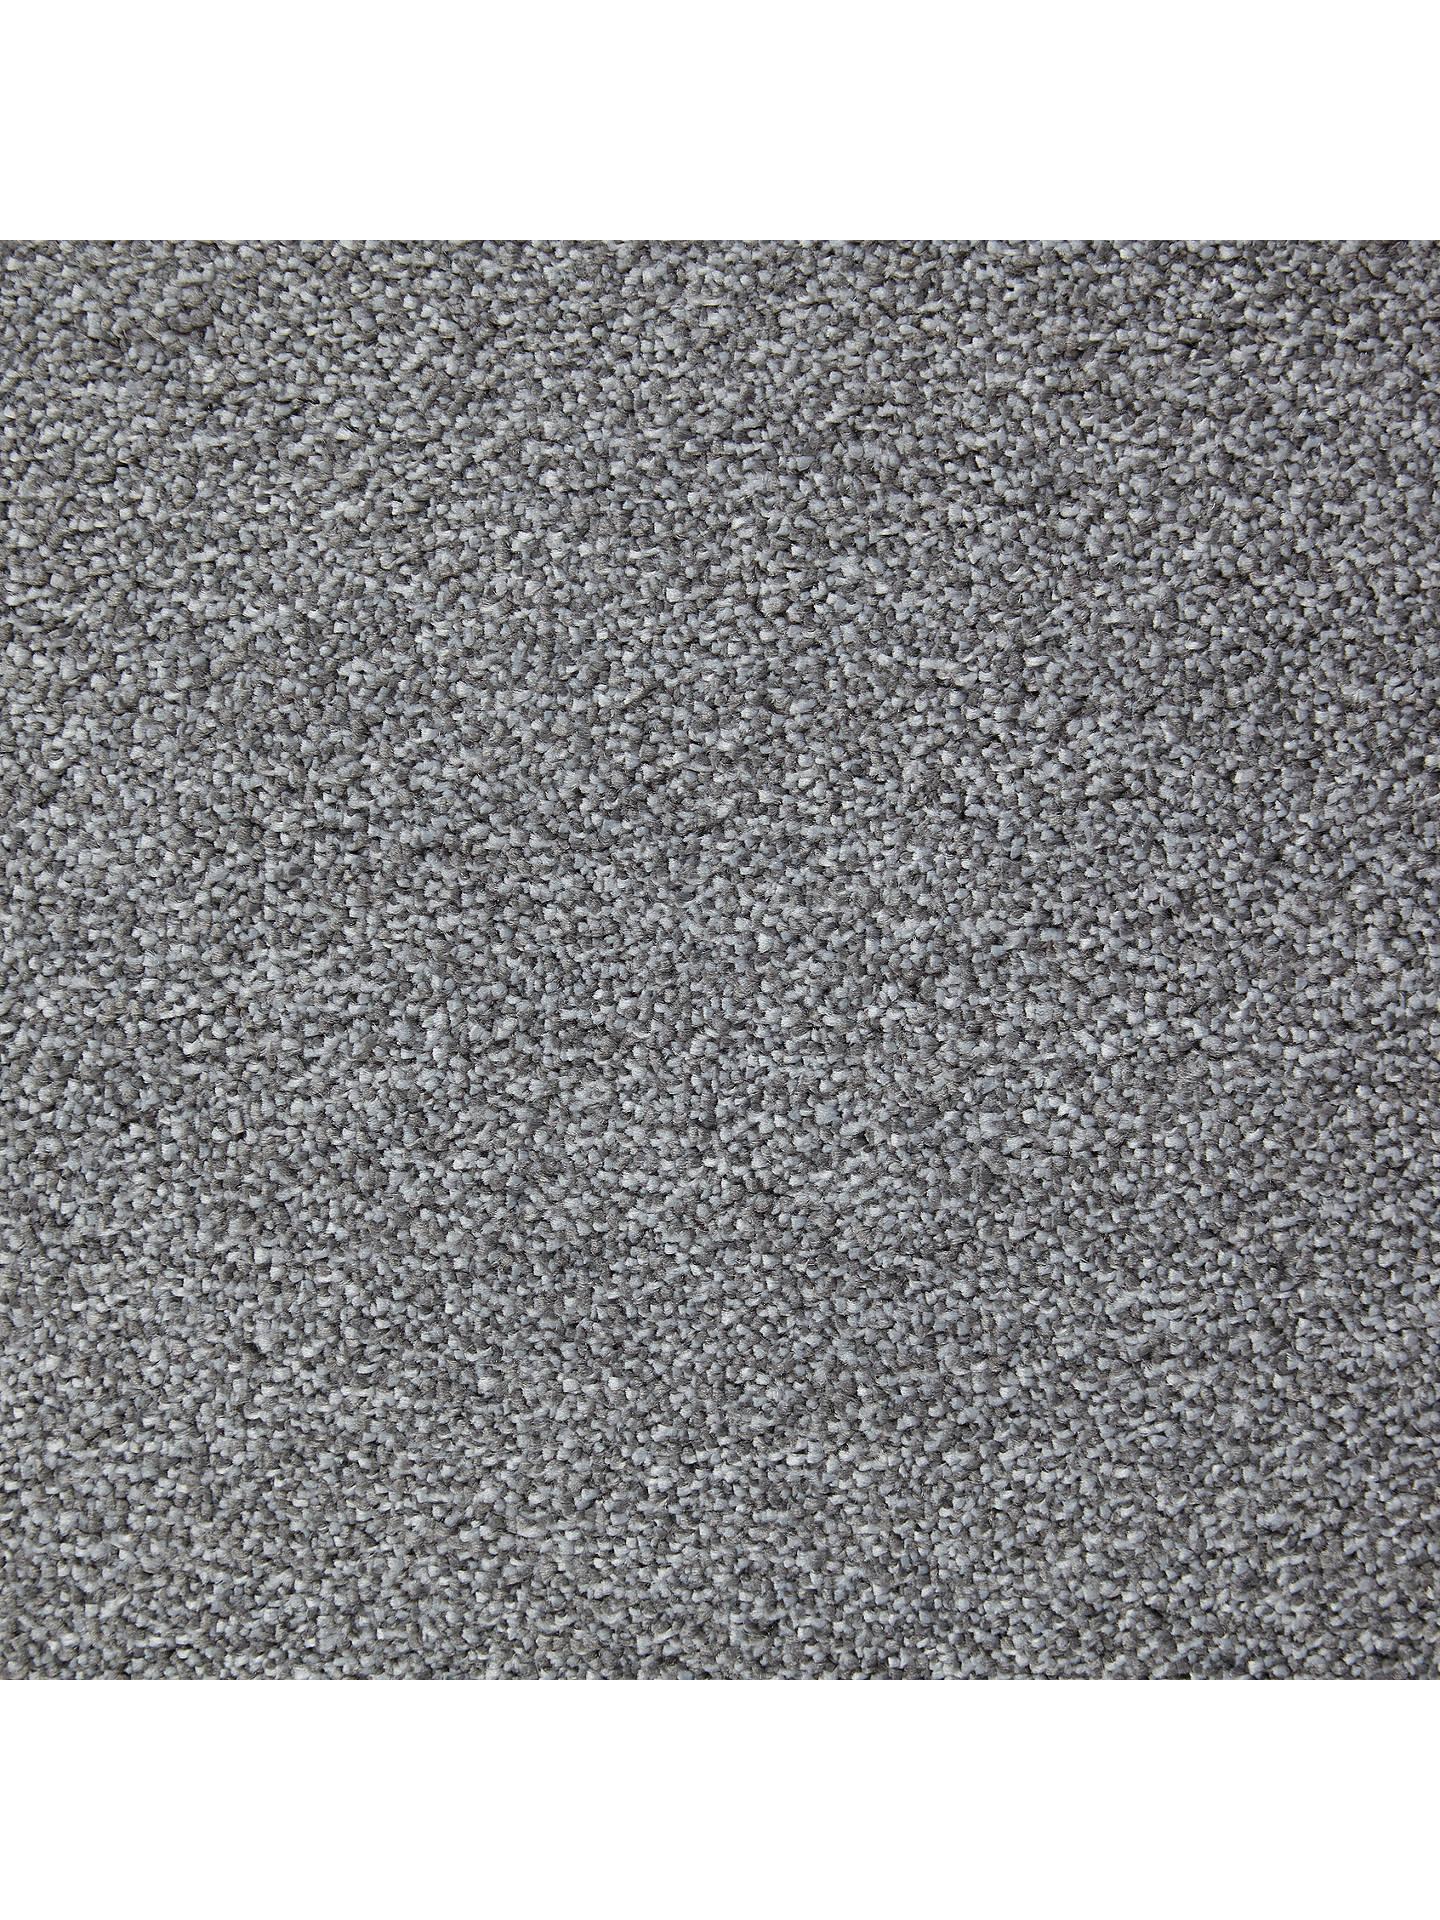 john lewis partners sublime 69oz twist pile carpet at. Black Bedroom Furniture Sets. Home Design Ideas